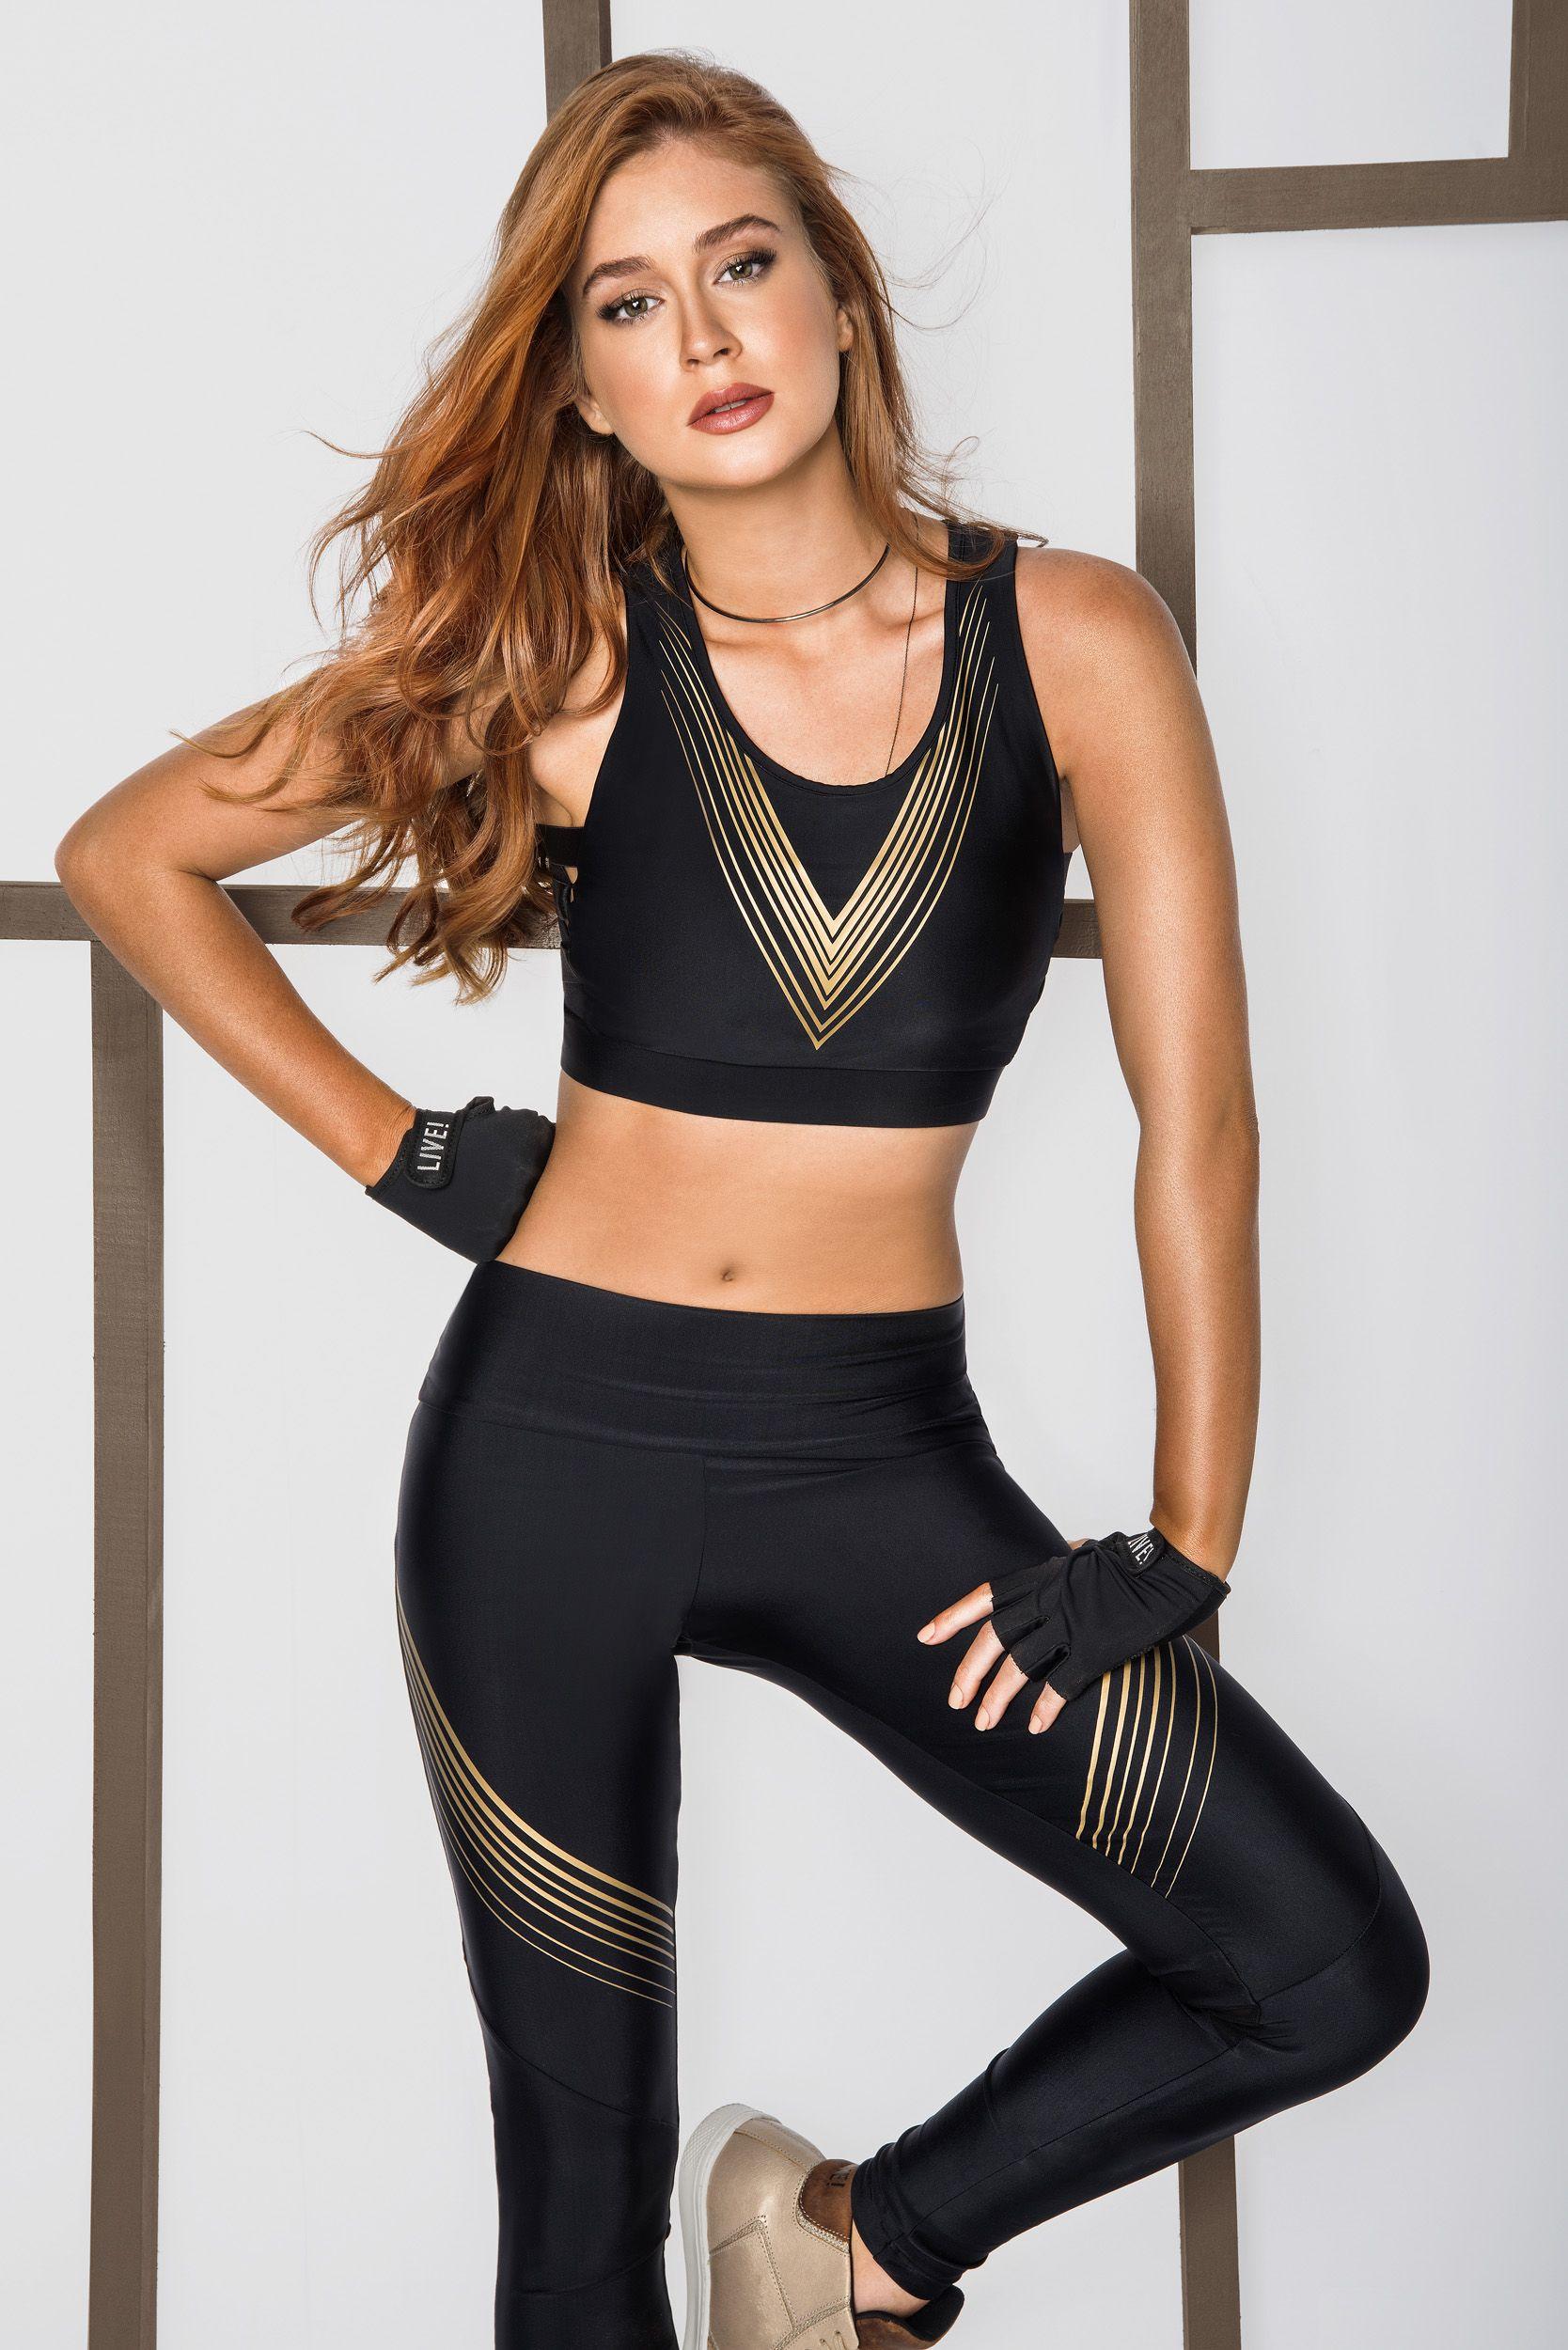 6cc98b725 LIVELINESS 2018 FITNESS com Marina Ruy Barbosa Exercícios Fitness